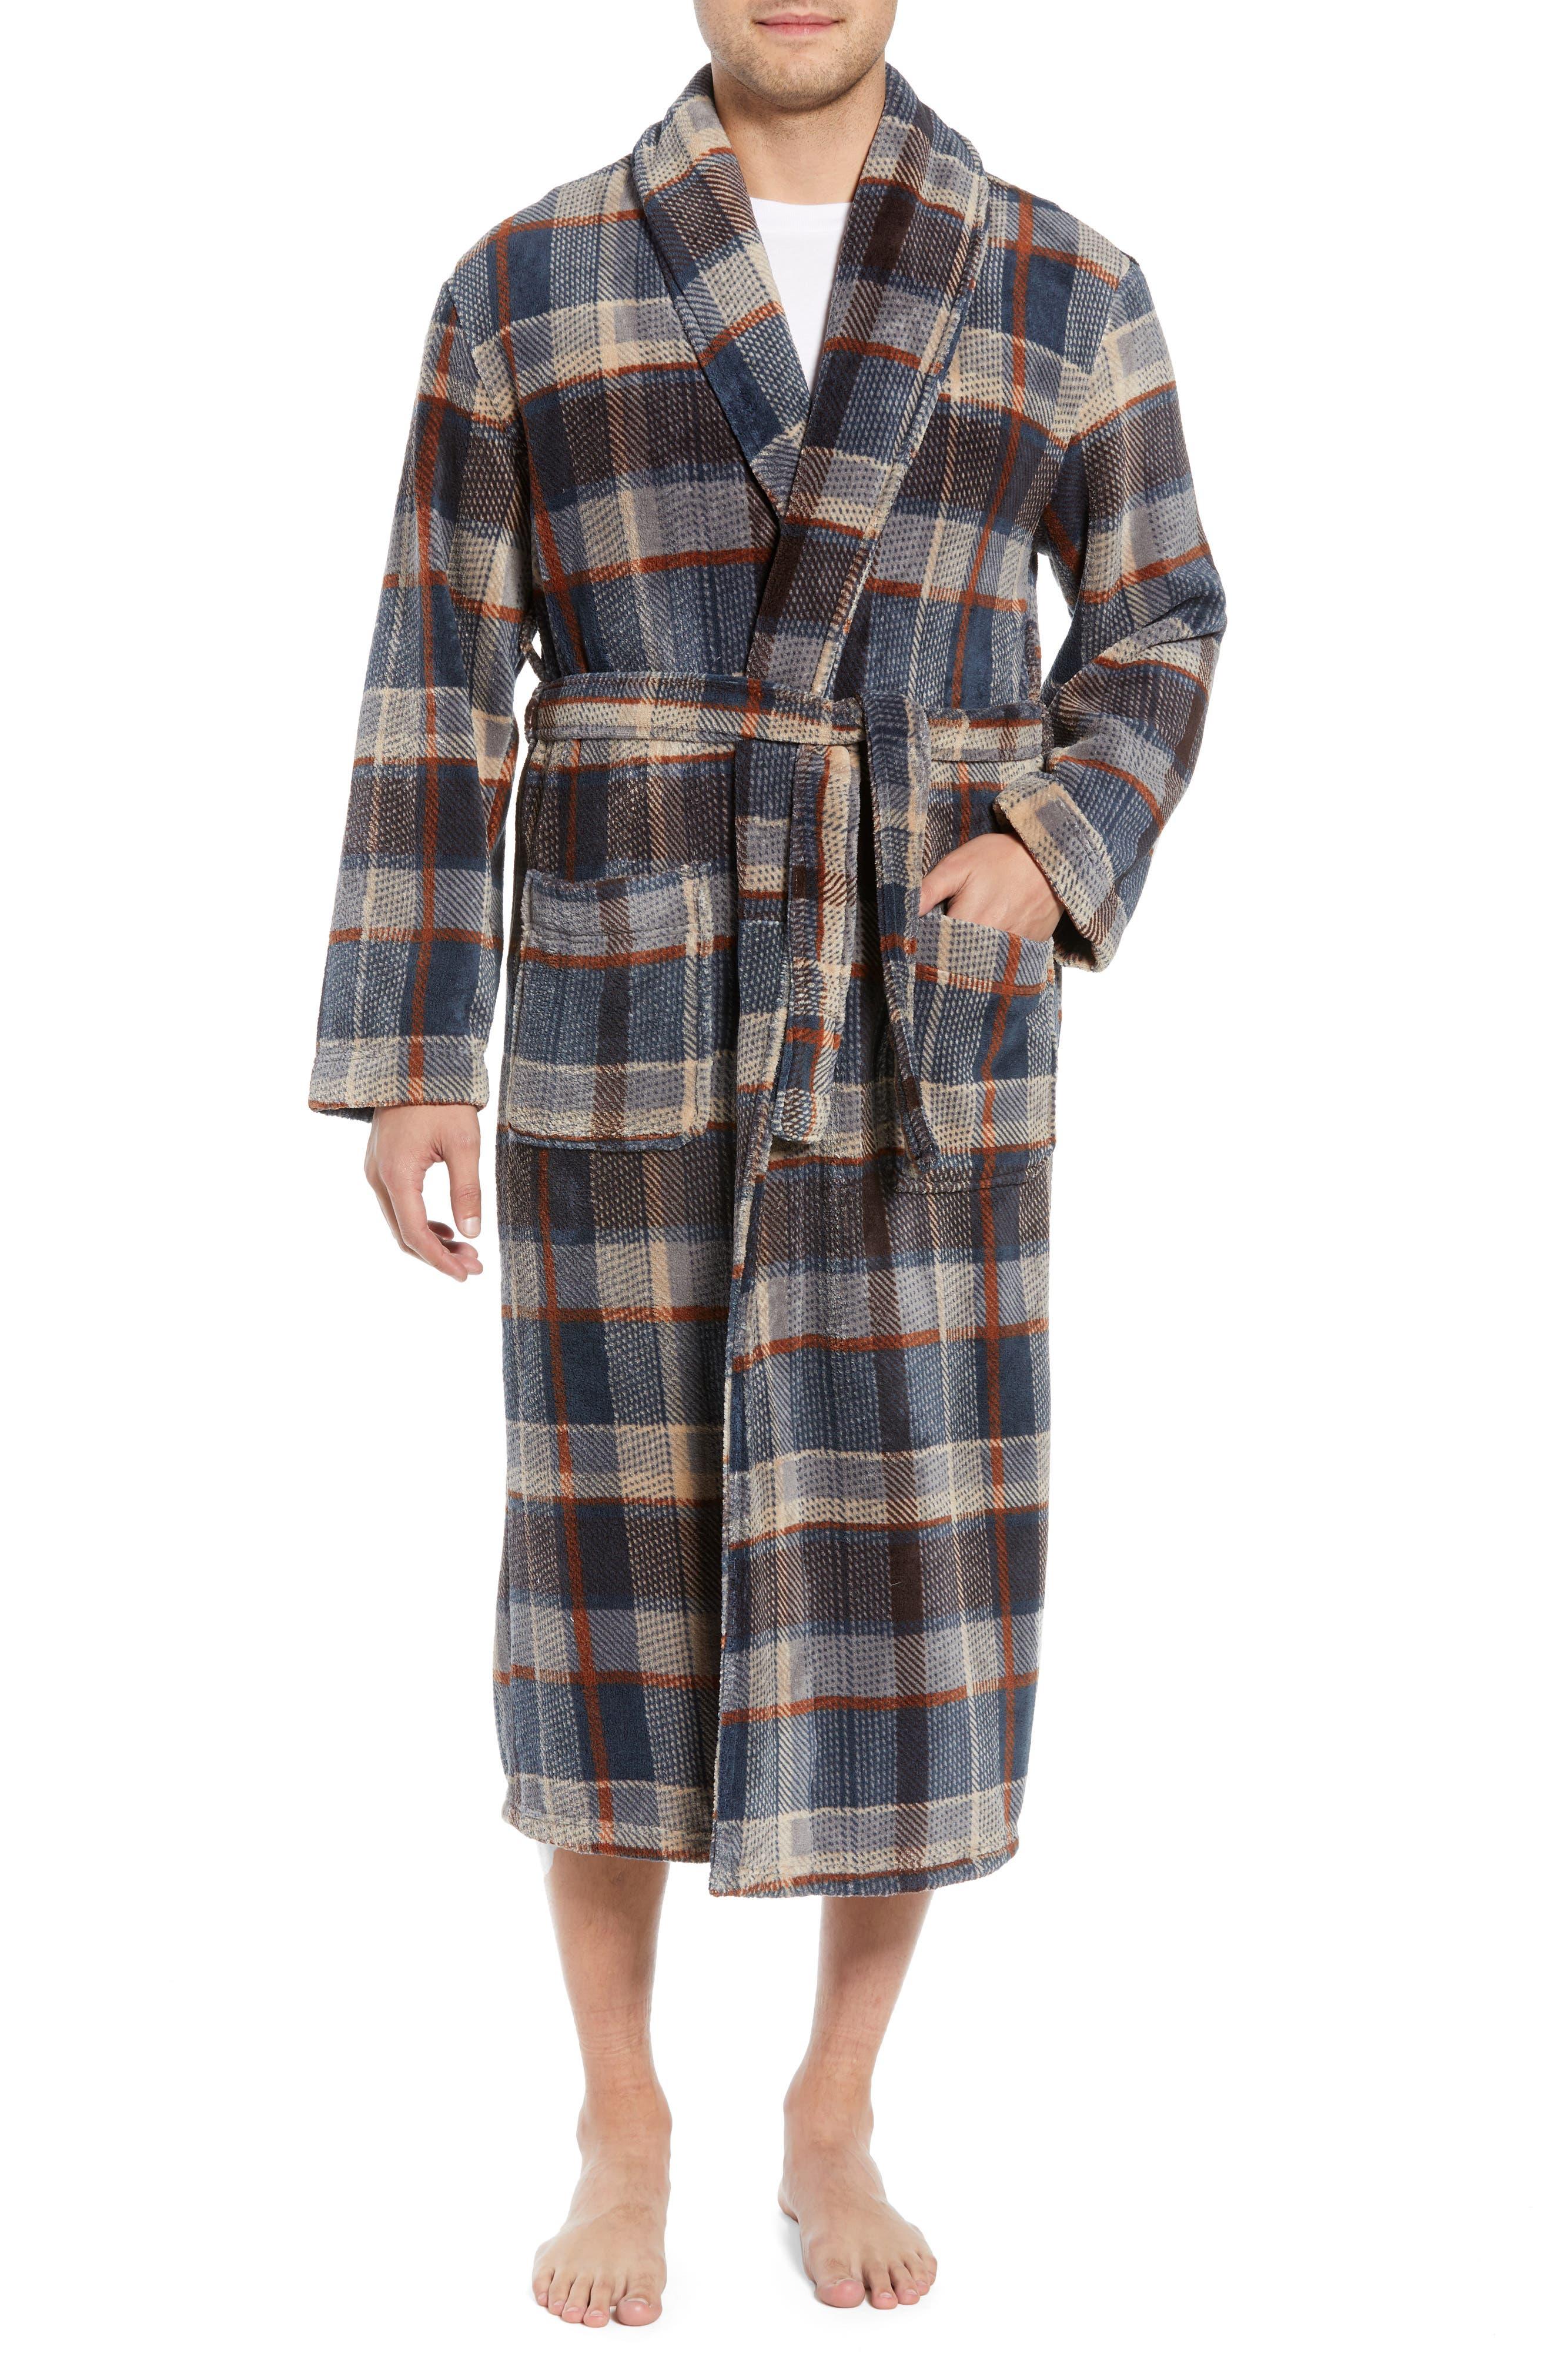 MAJESTIC INTERNATIONAL, Mountains of Comfort Shawl Fleece Bath Robe, Main thumbnail 1, color, COFFEE